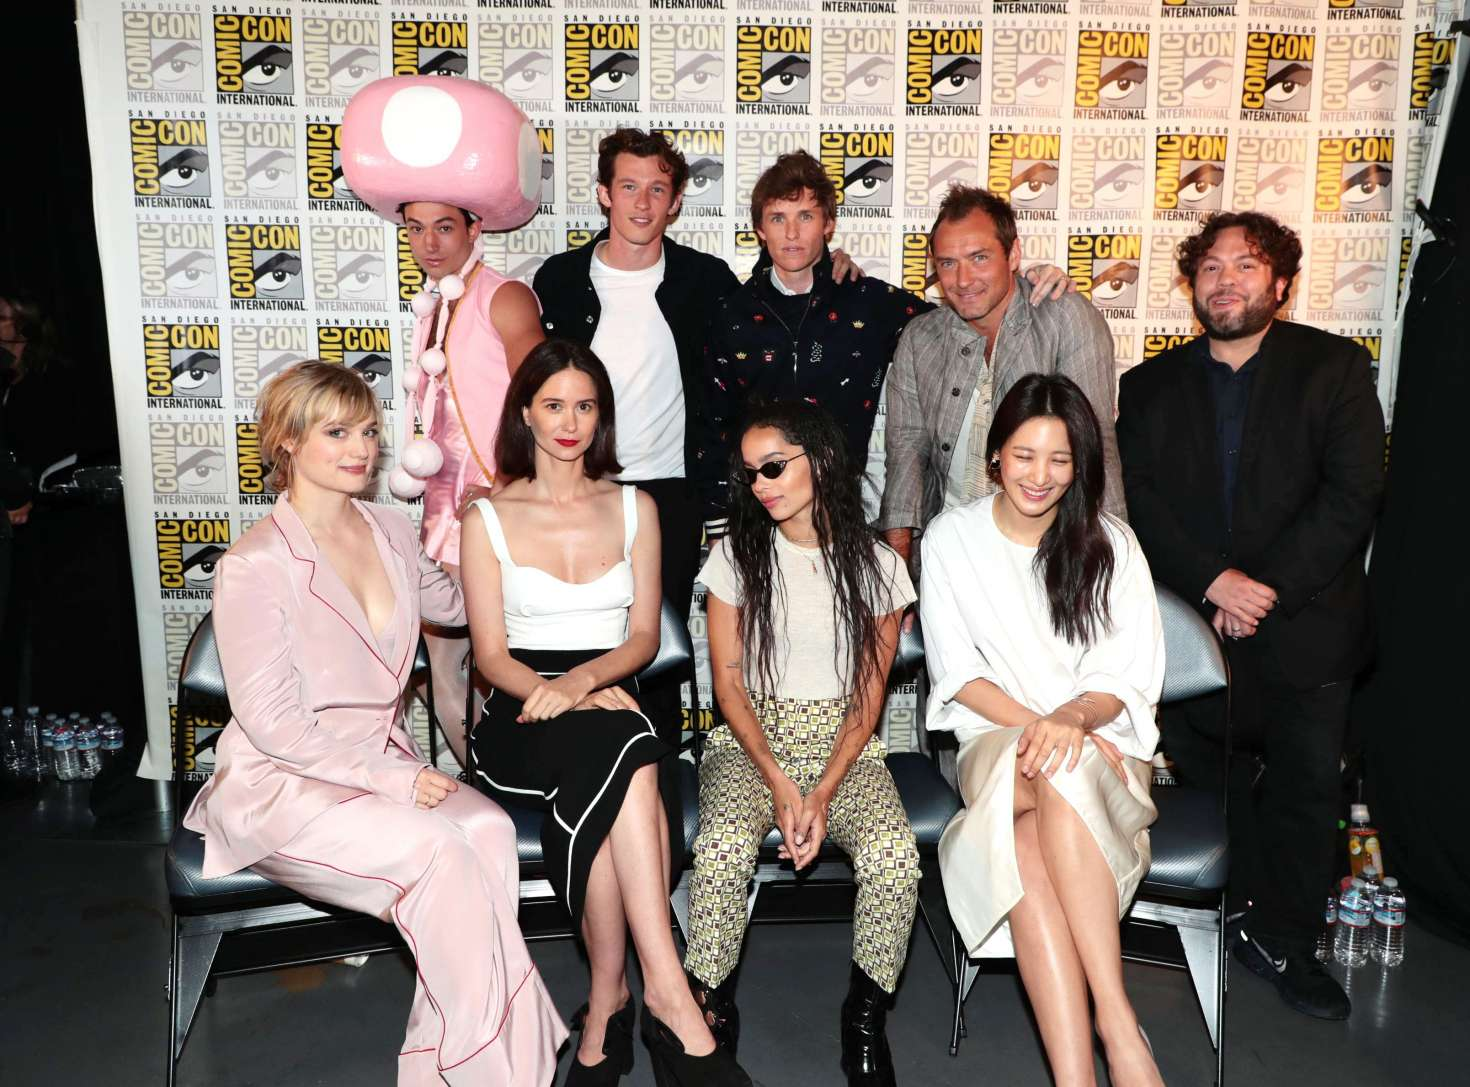 Alison Sudol Katherine Waterston Zoe Kravitz - Warner Bros. Presentation at 2018 Comic-Con in San Diego